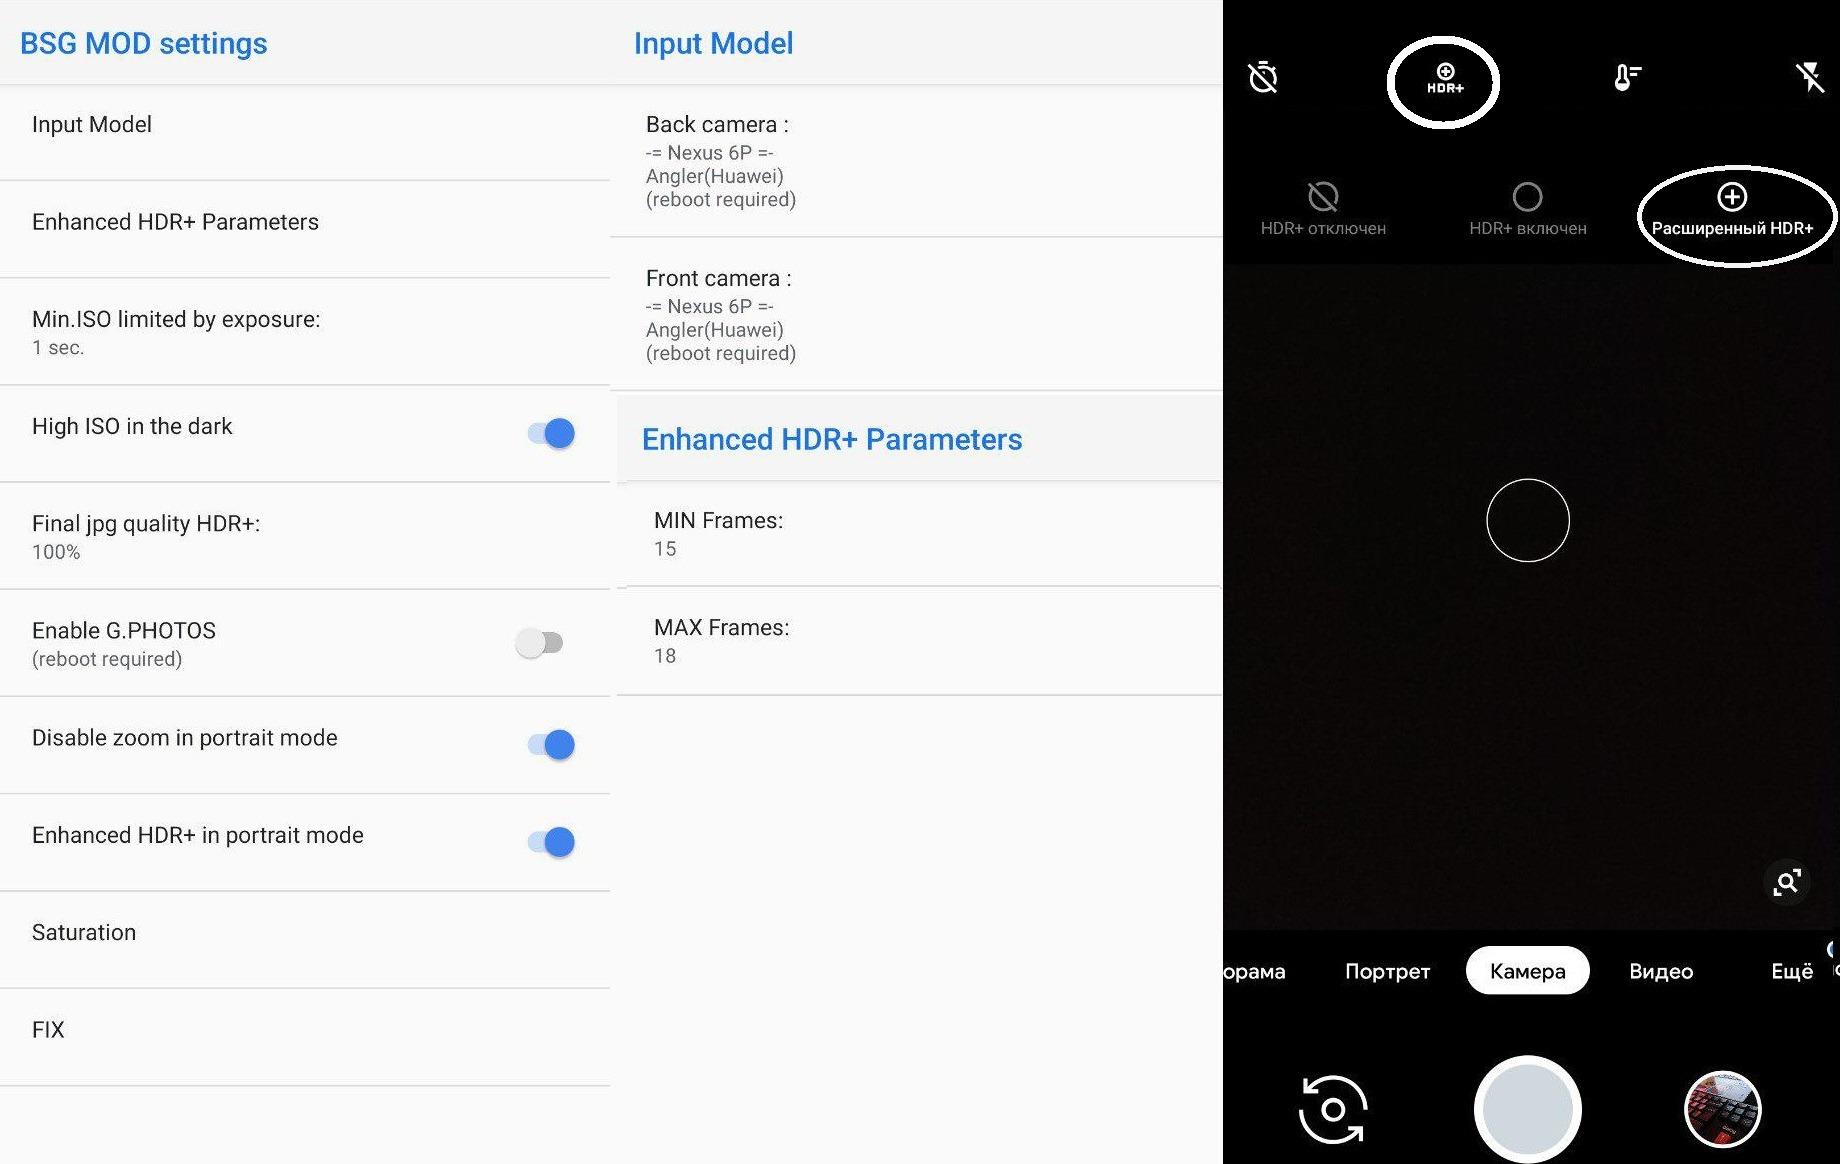 04/04/2019] [MI 8 GCAM] Xiaomi MI 8 Google Camera Mod (Stable) [BSG